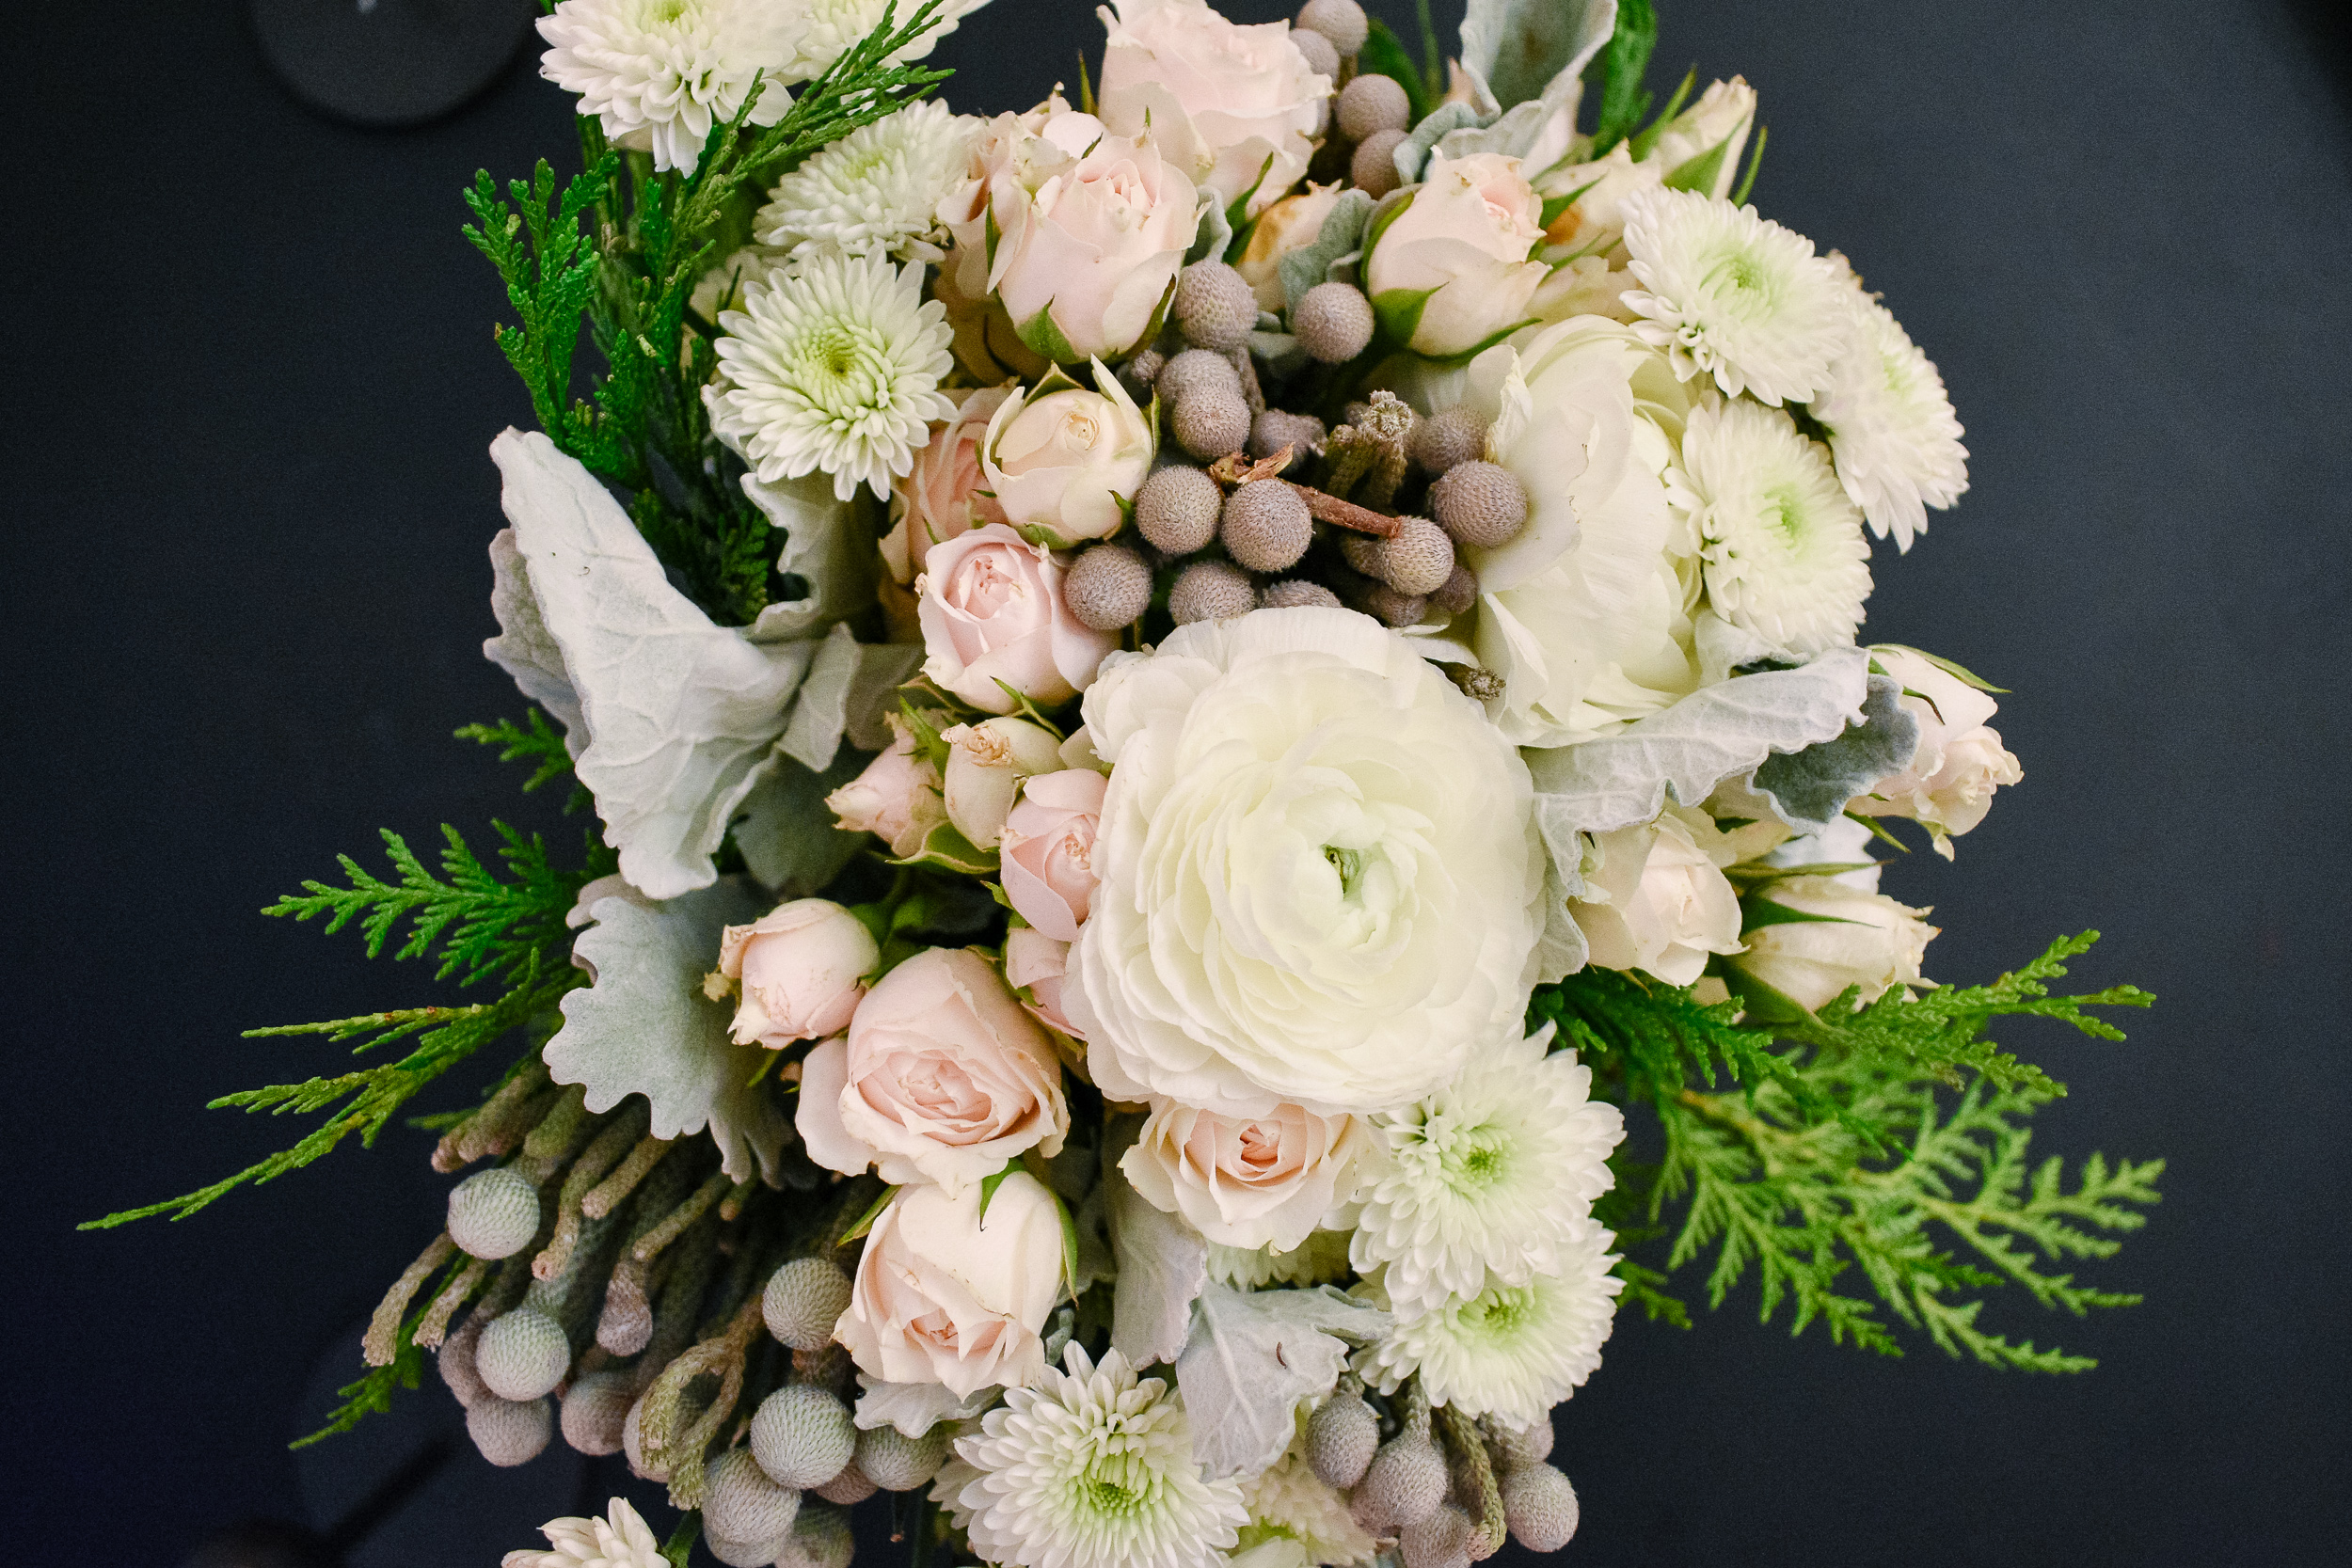 Minimalist Christmas Decorations: Winter Bouquet